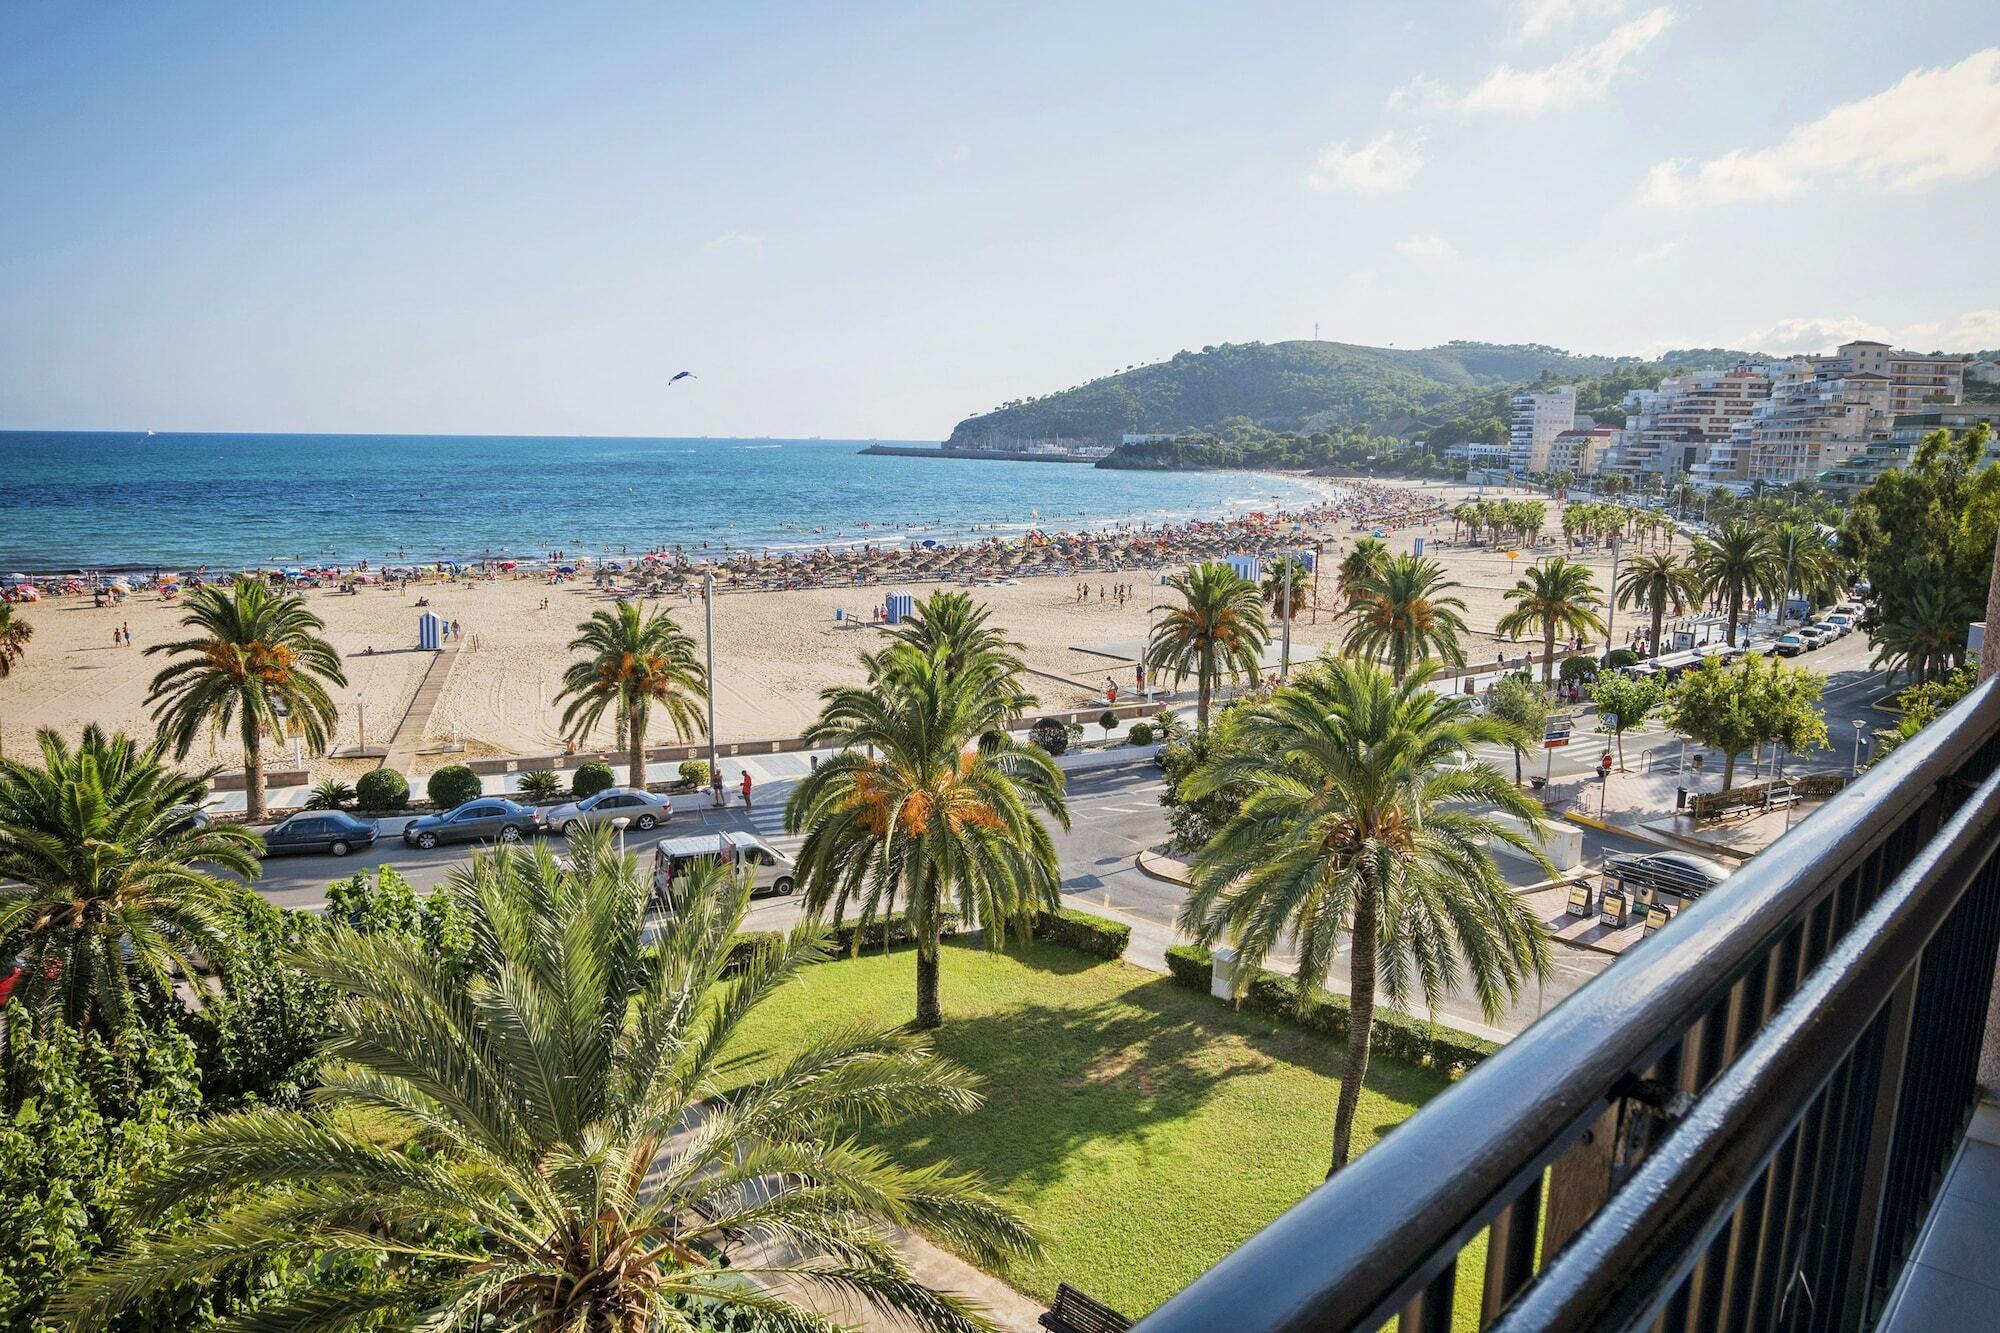 Hotel Neptuno Oropesa Del Mar 3 Espanha Taxas A Partir De 92